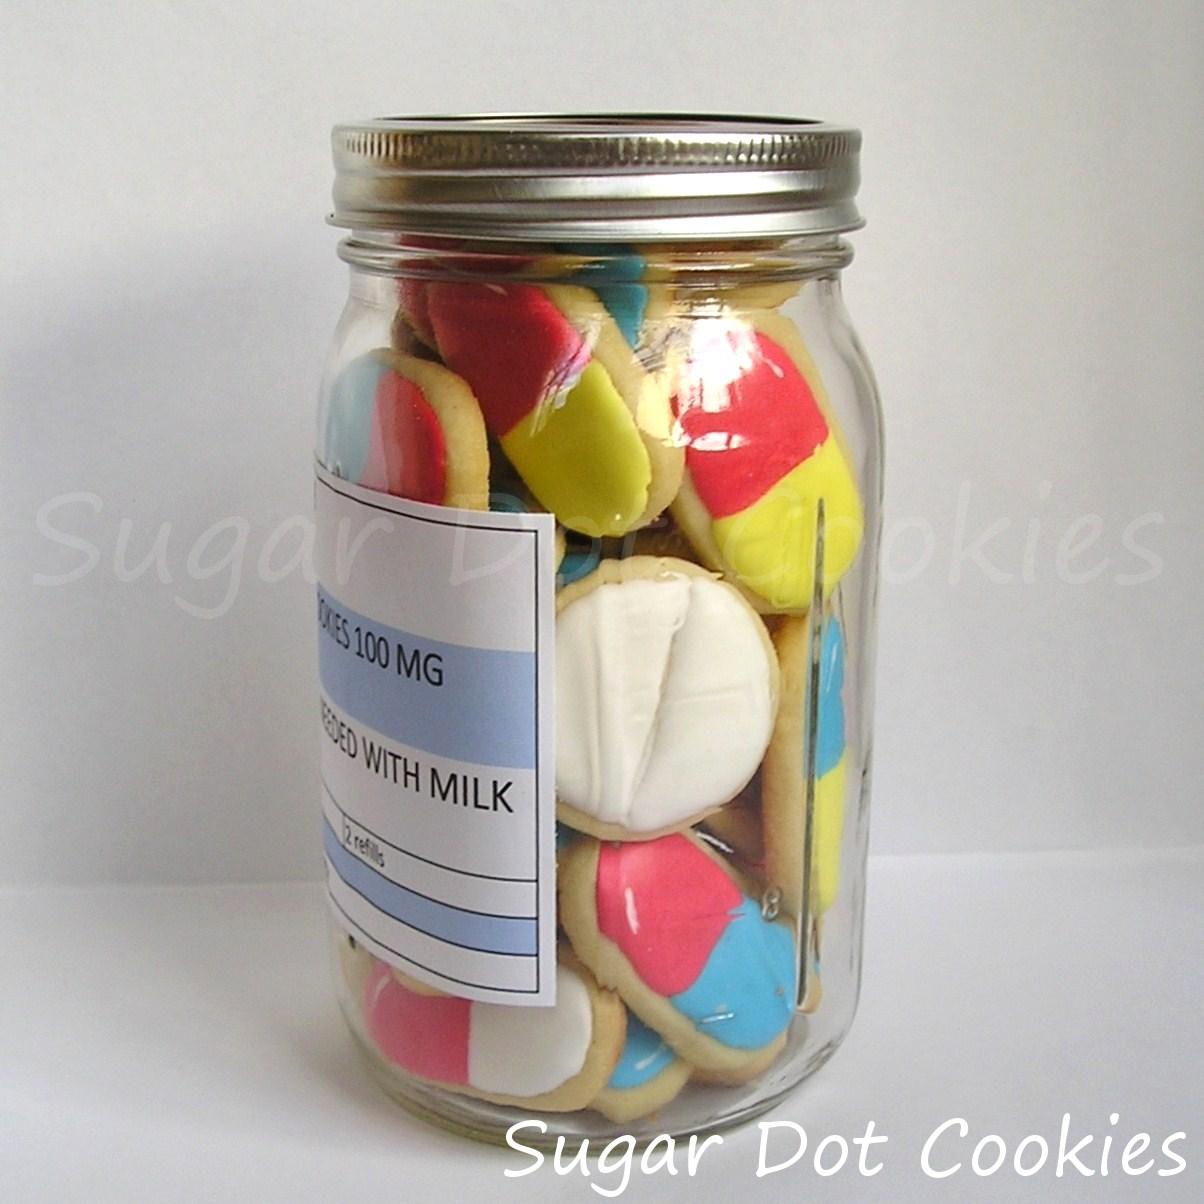 Sugar Dot Cookies Get Well Soon